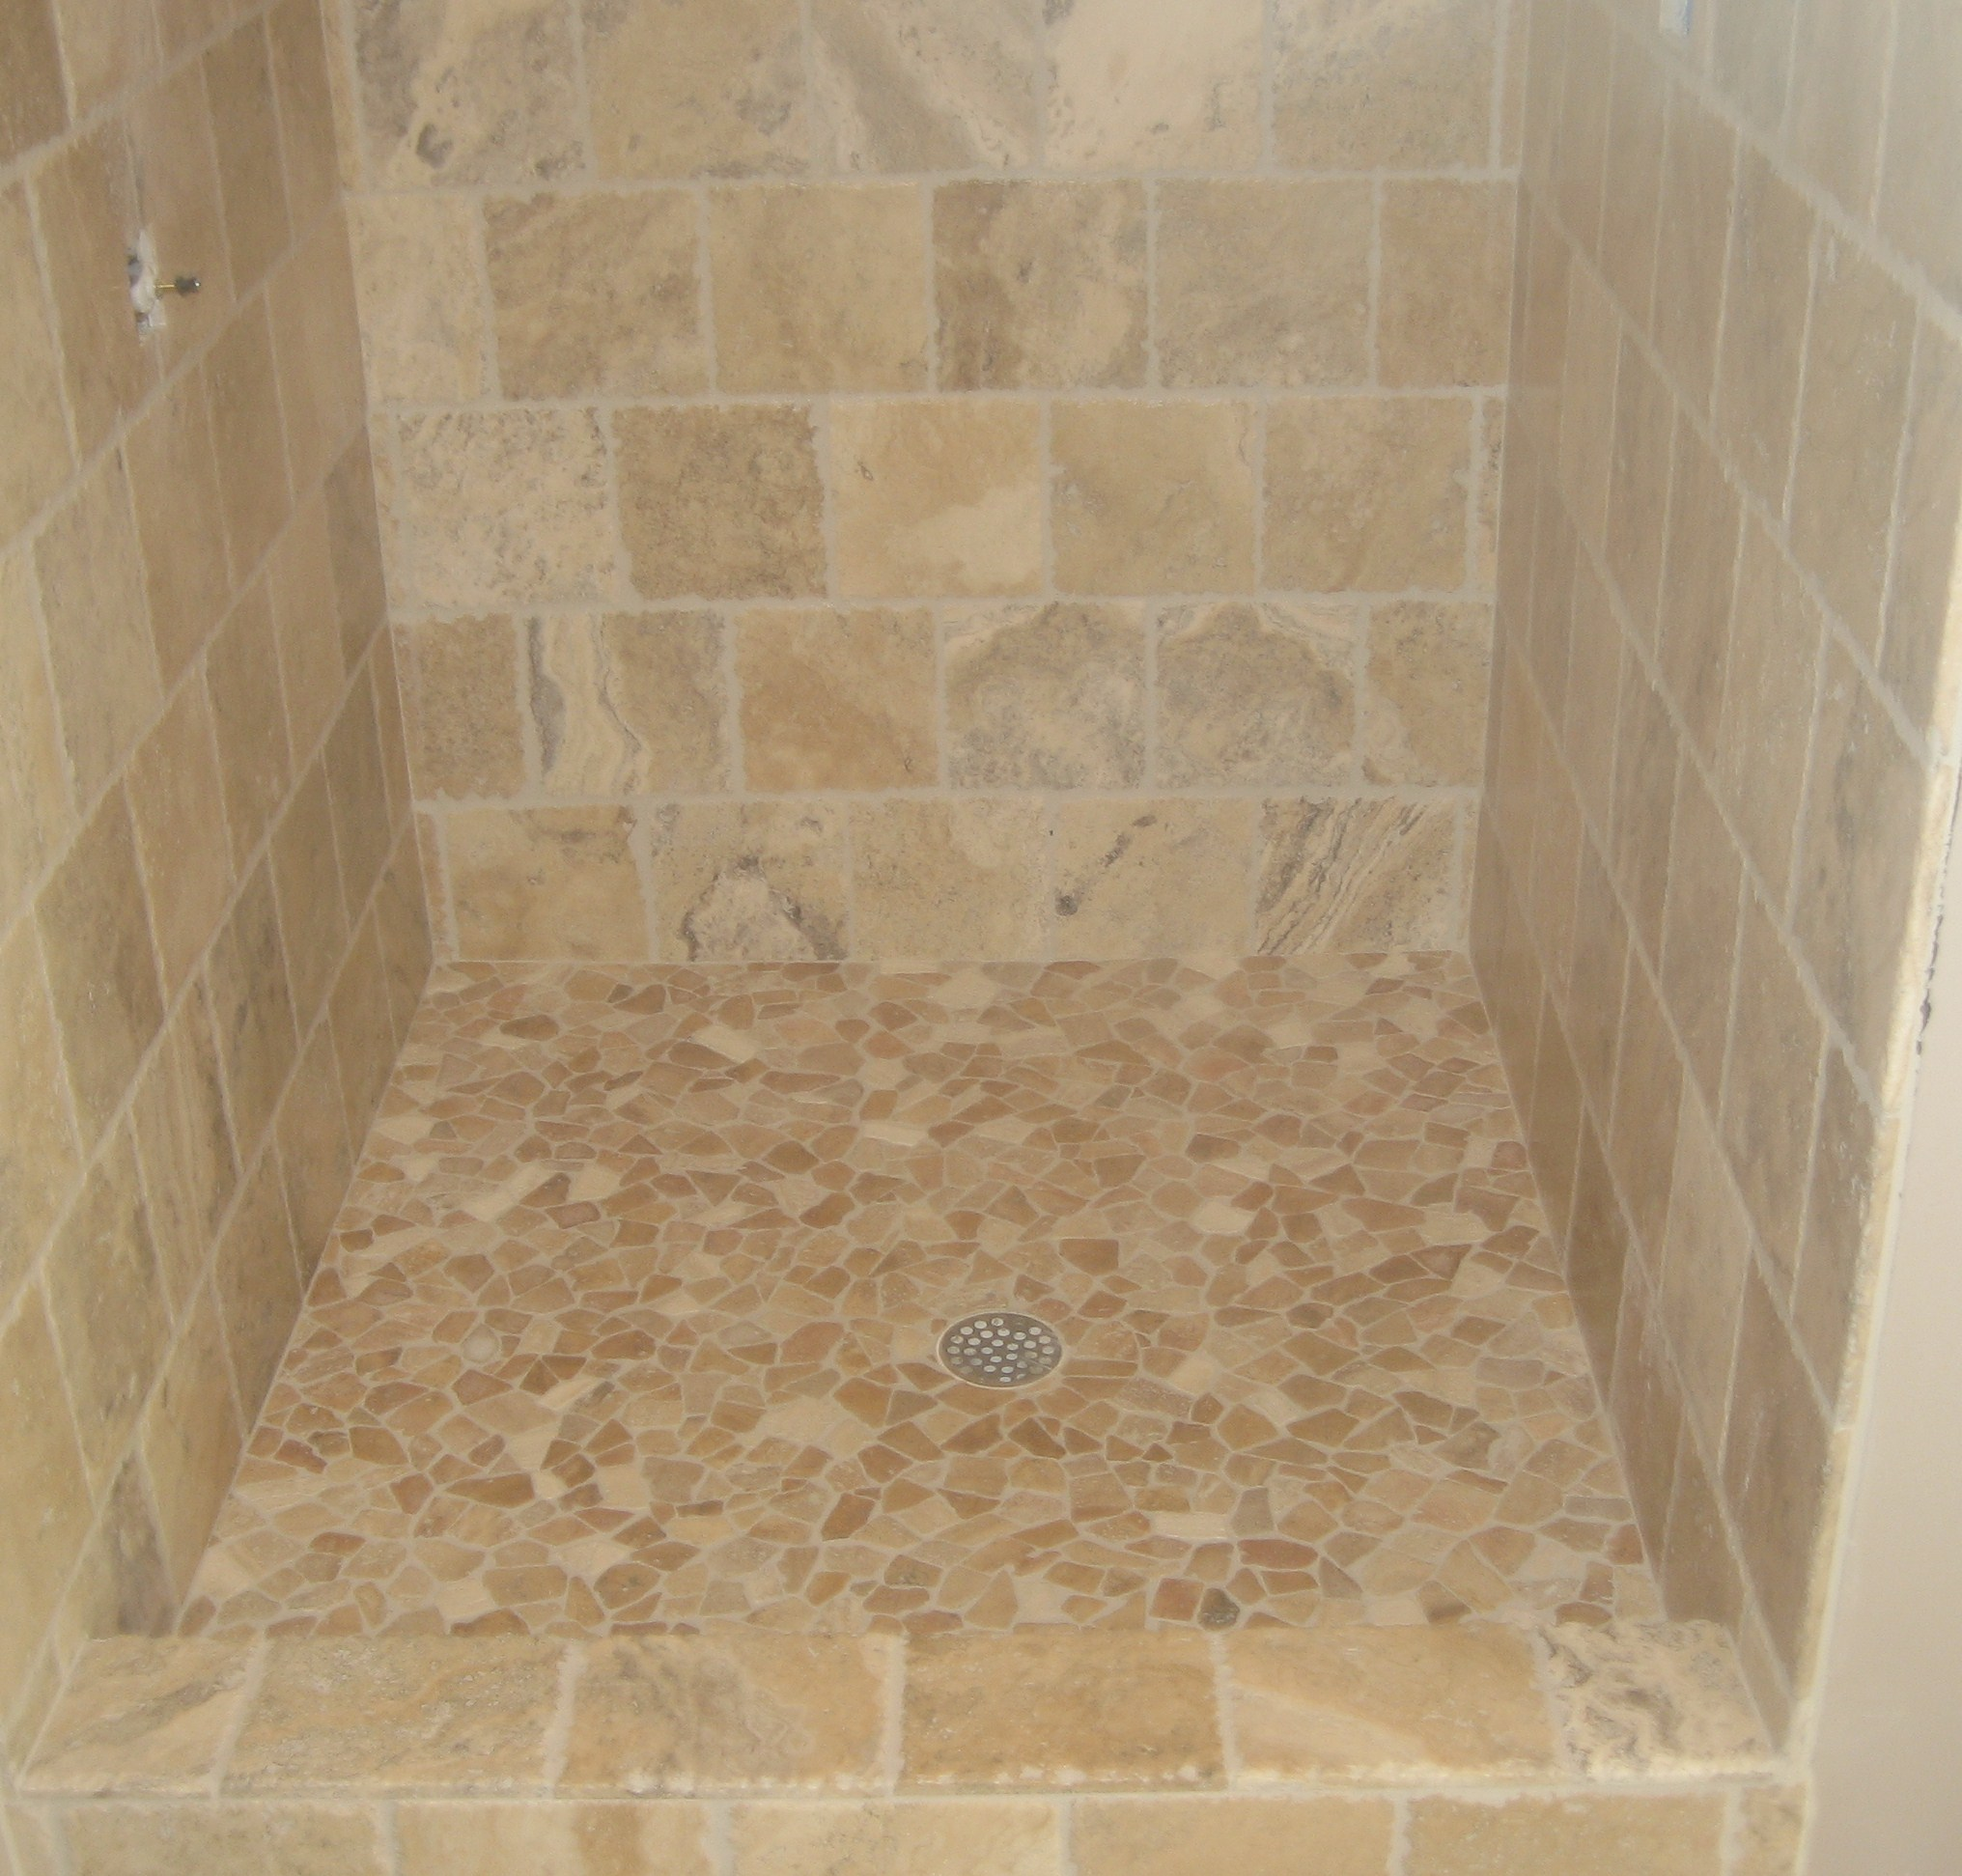 Bathroom Shower Tile Installation Photo 11 Design Your Home